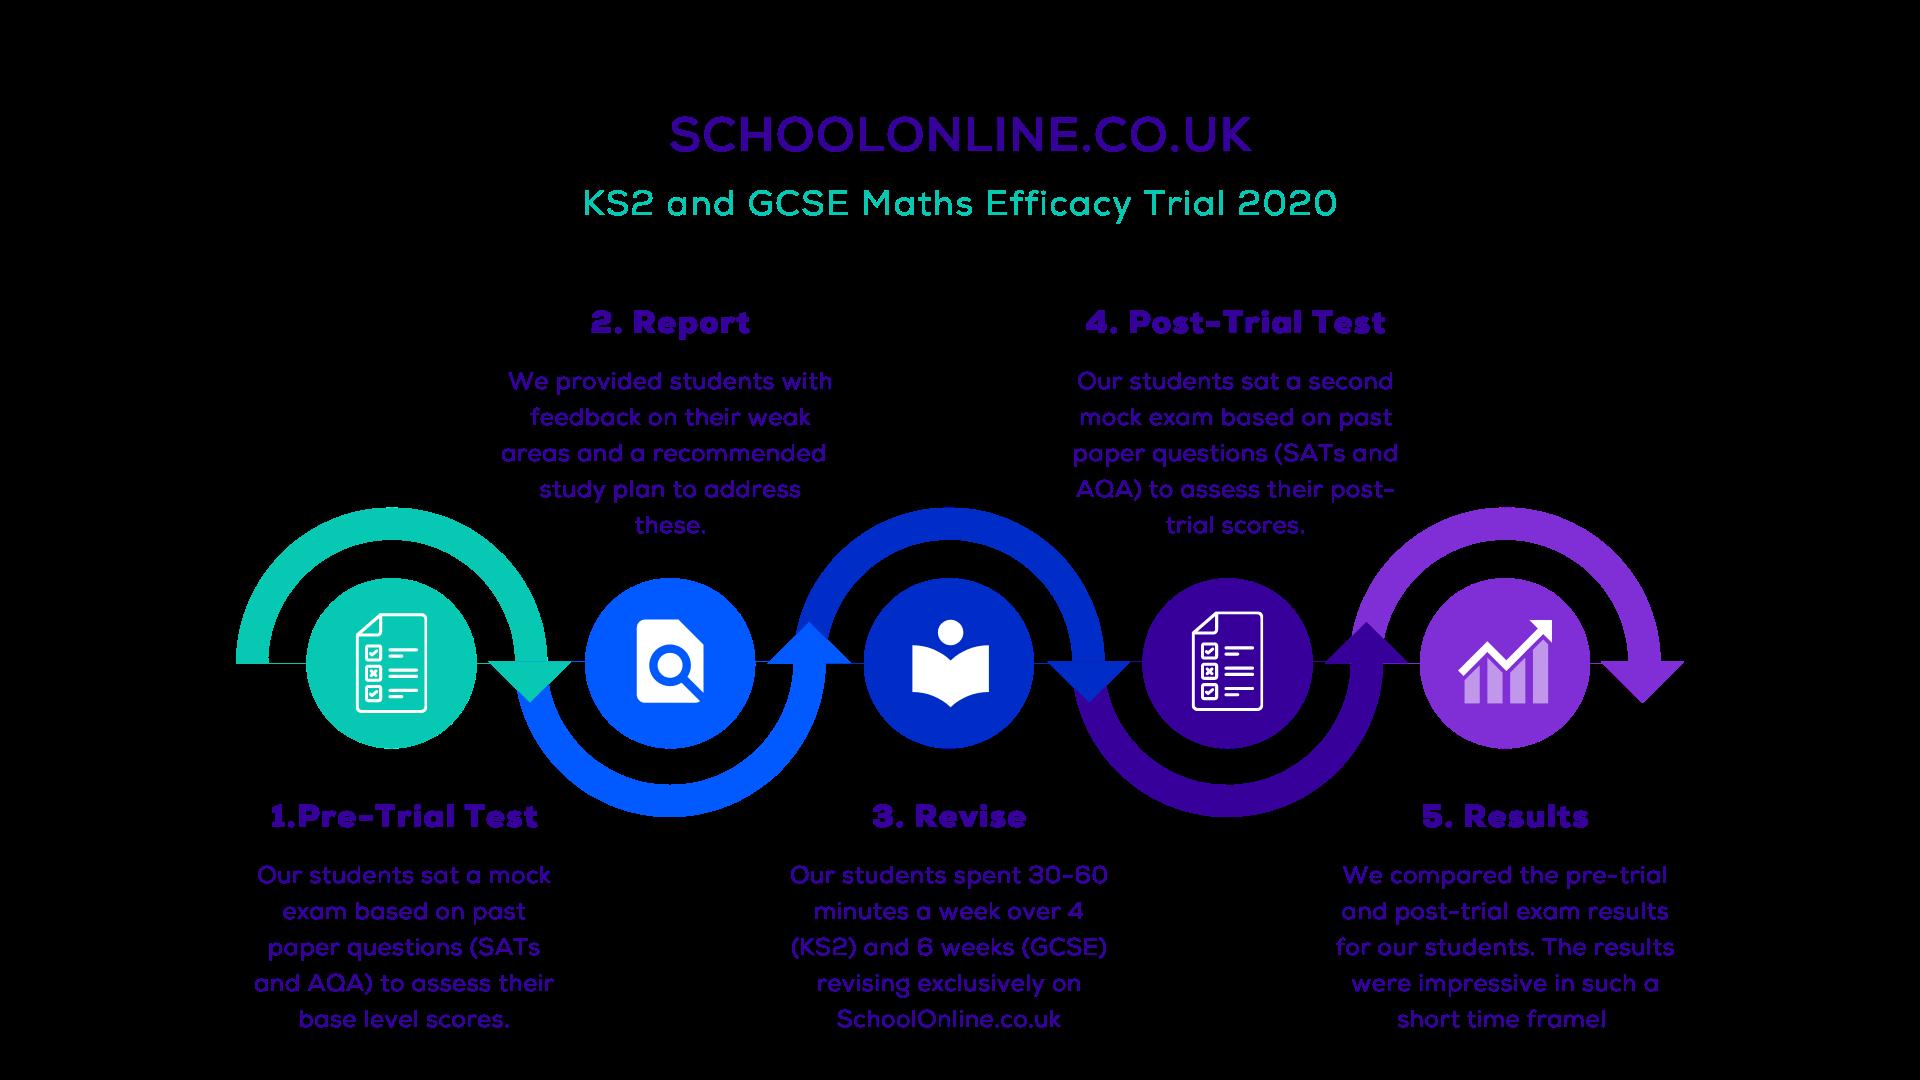 SchoolOnline Maths Trial GCSE Results